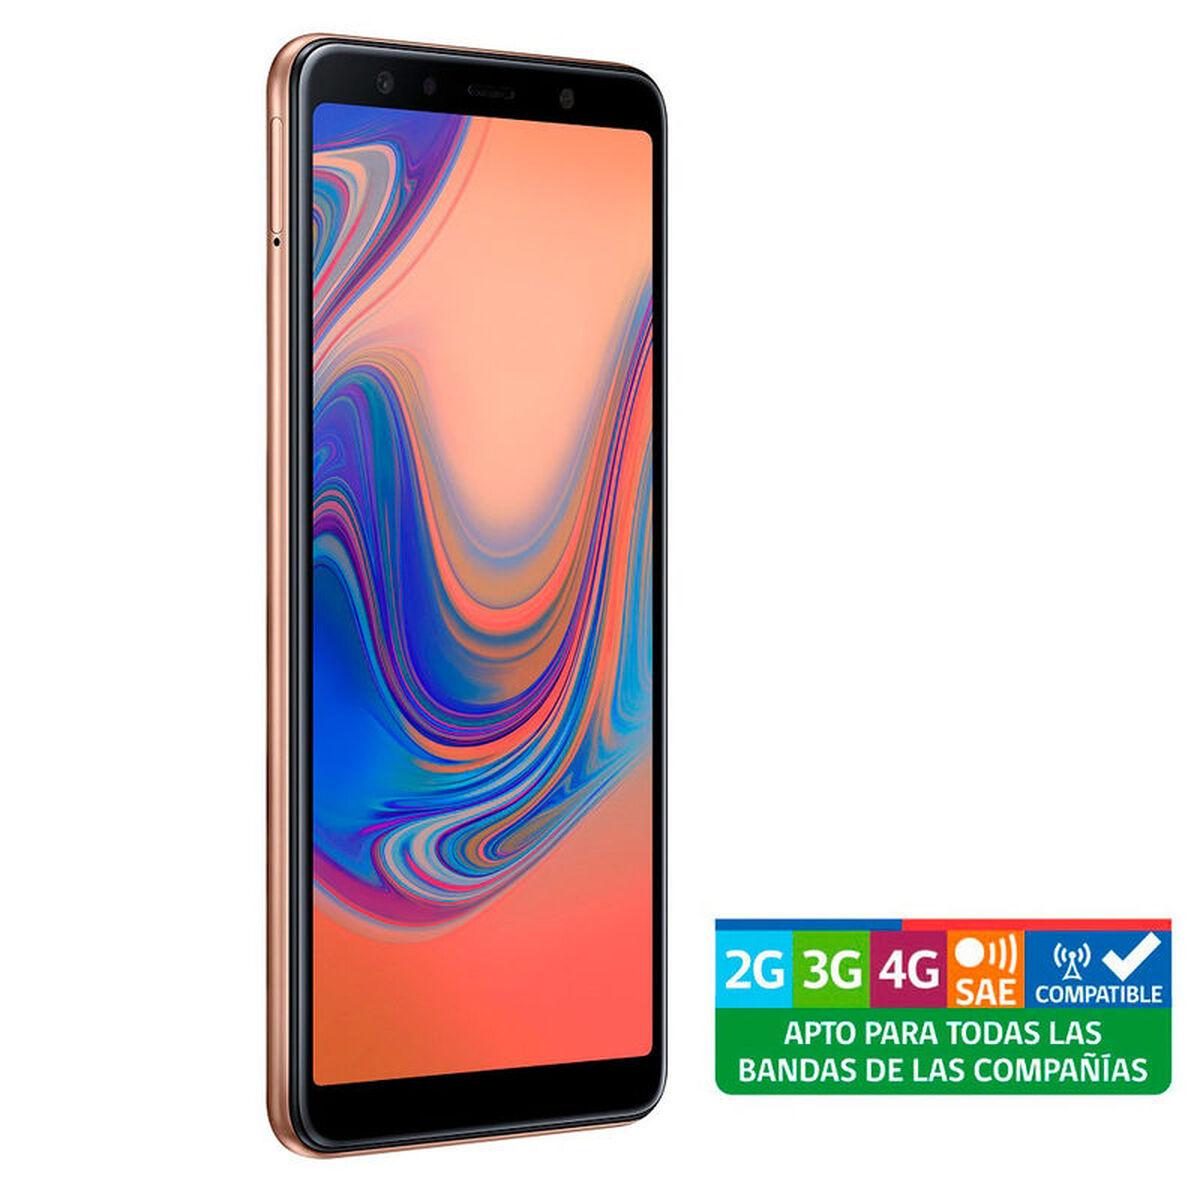 Celular Samsung A7 + Batería Portátil Samsung